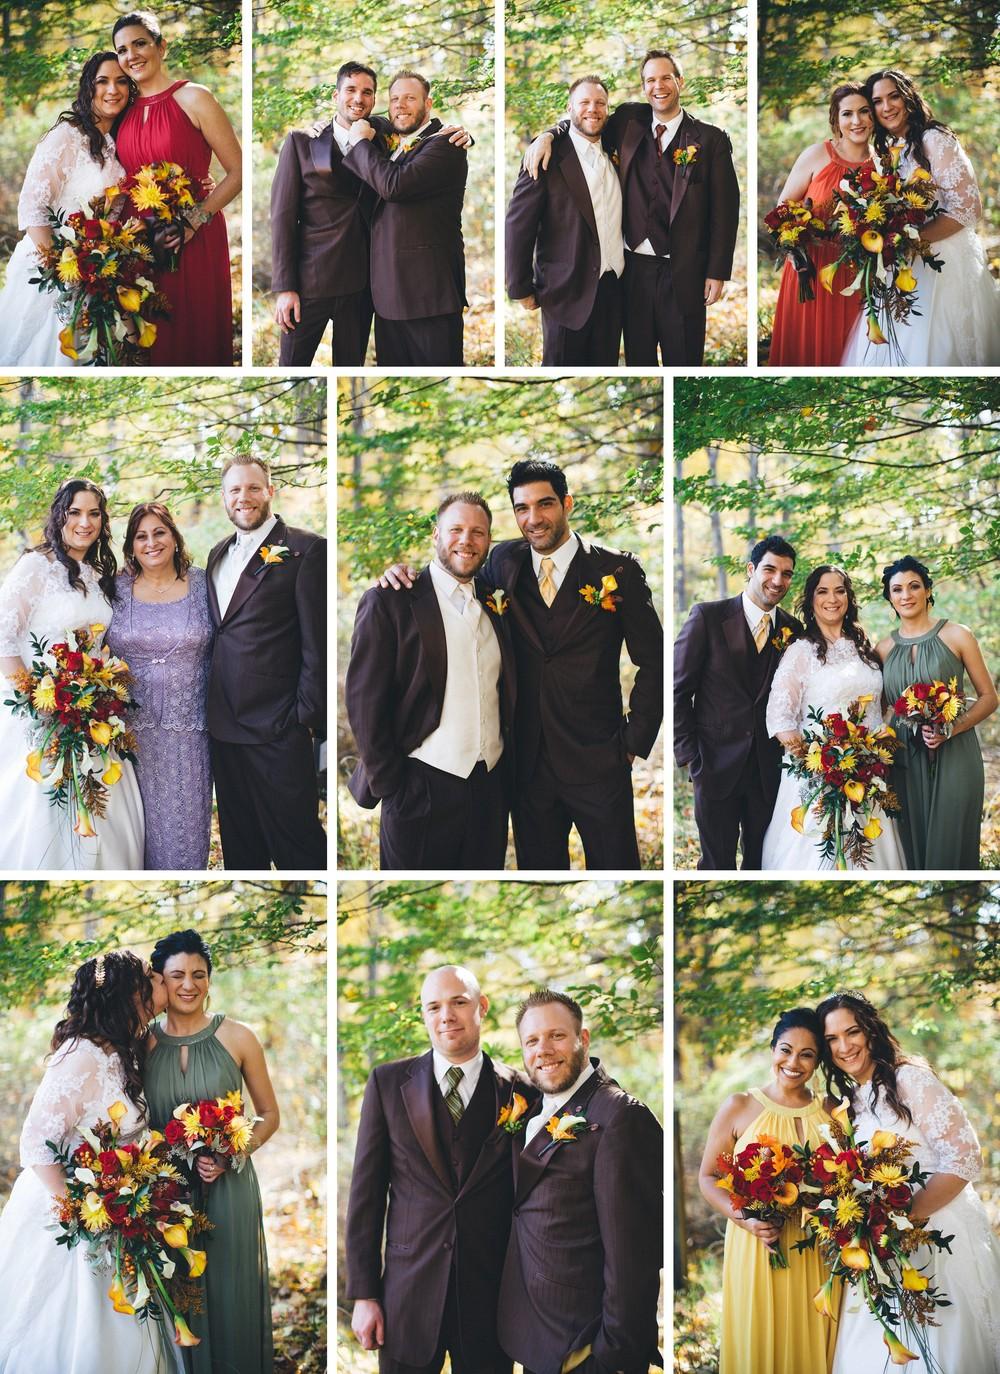 Greek Wedding Photographer in Cleveland 14.jpg